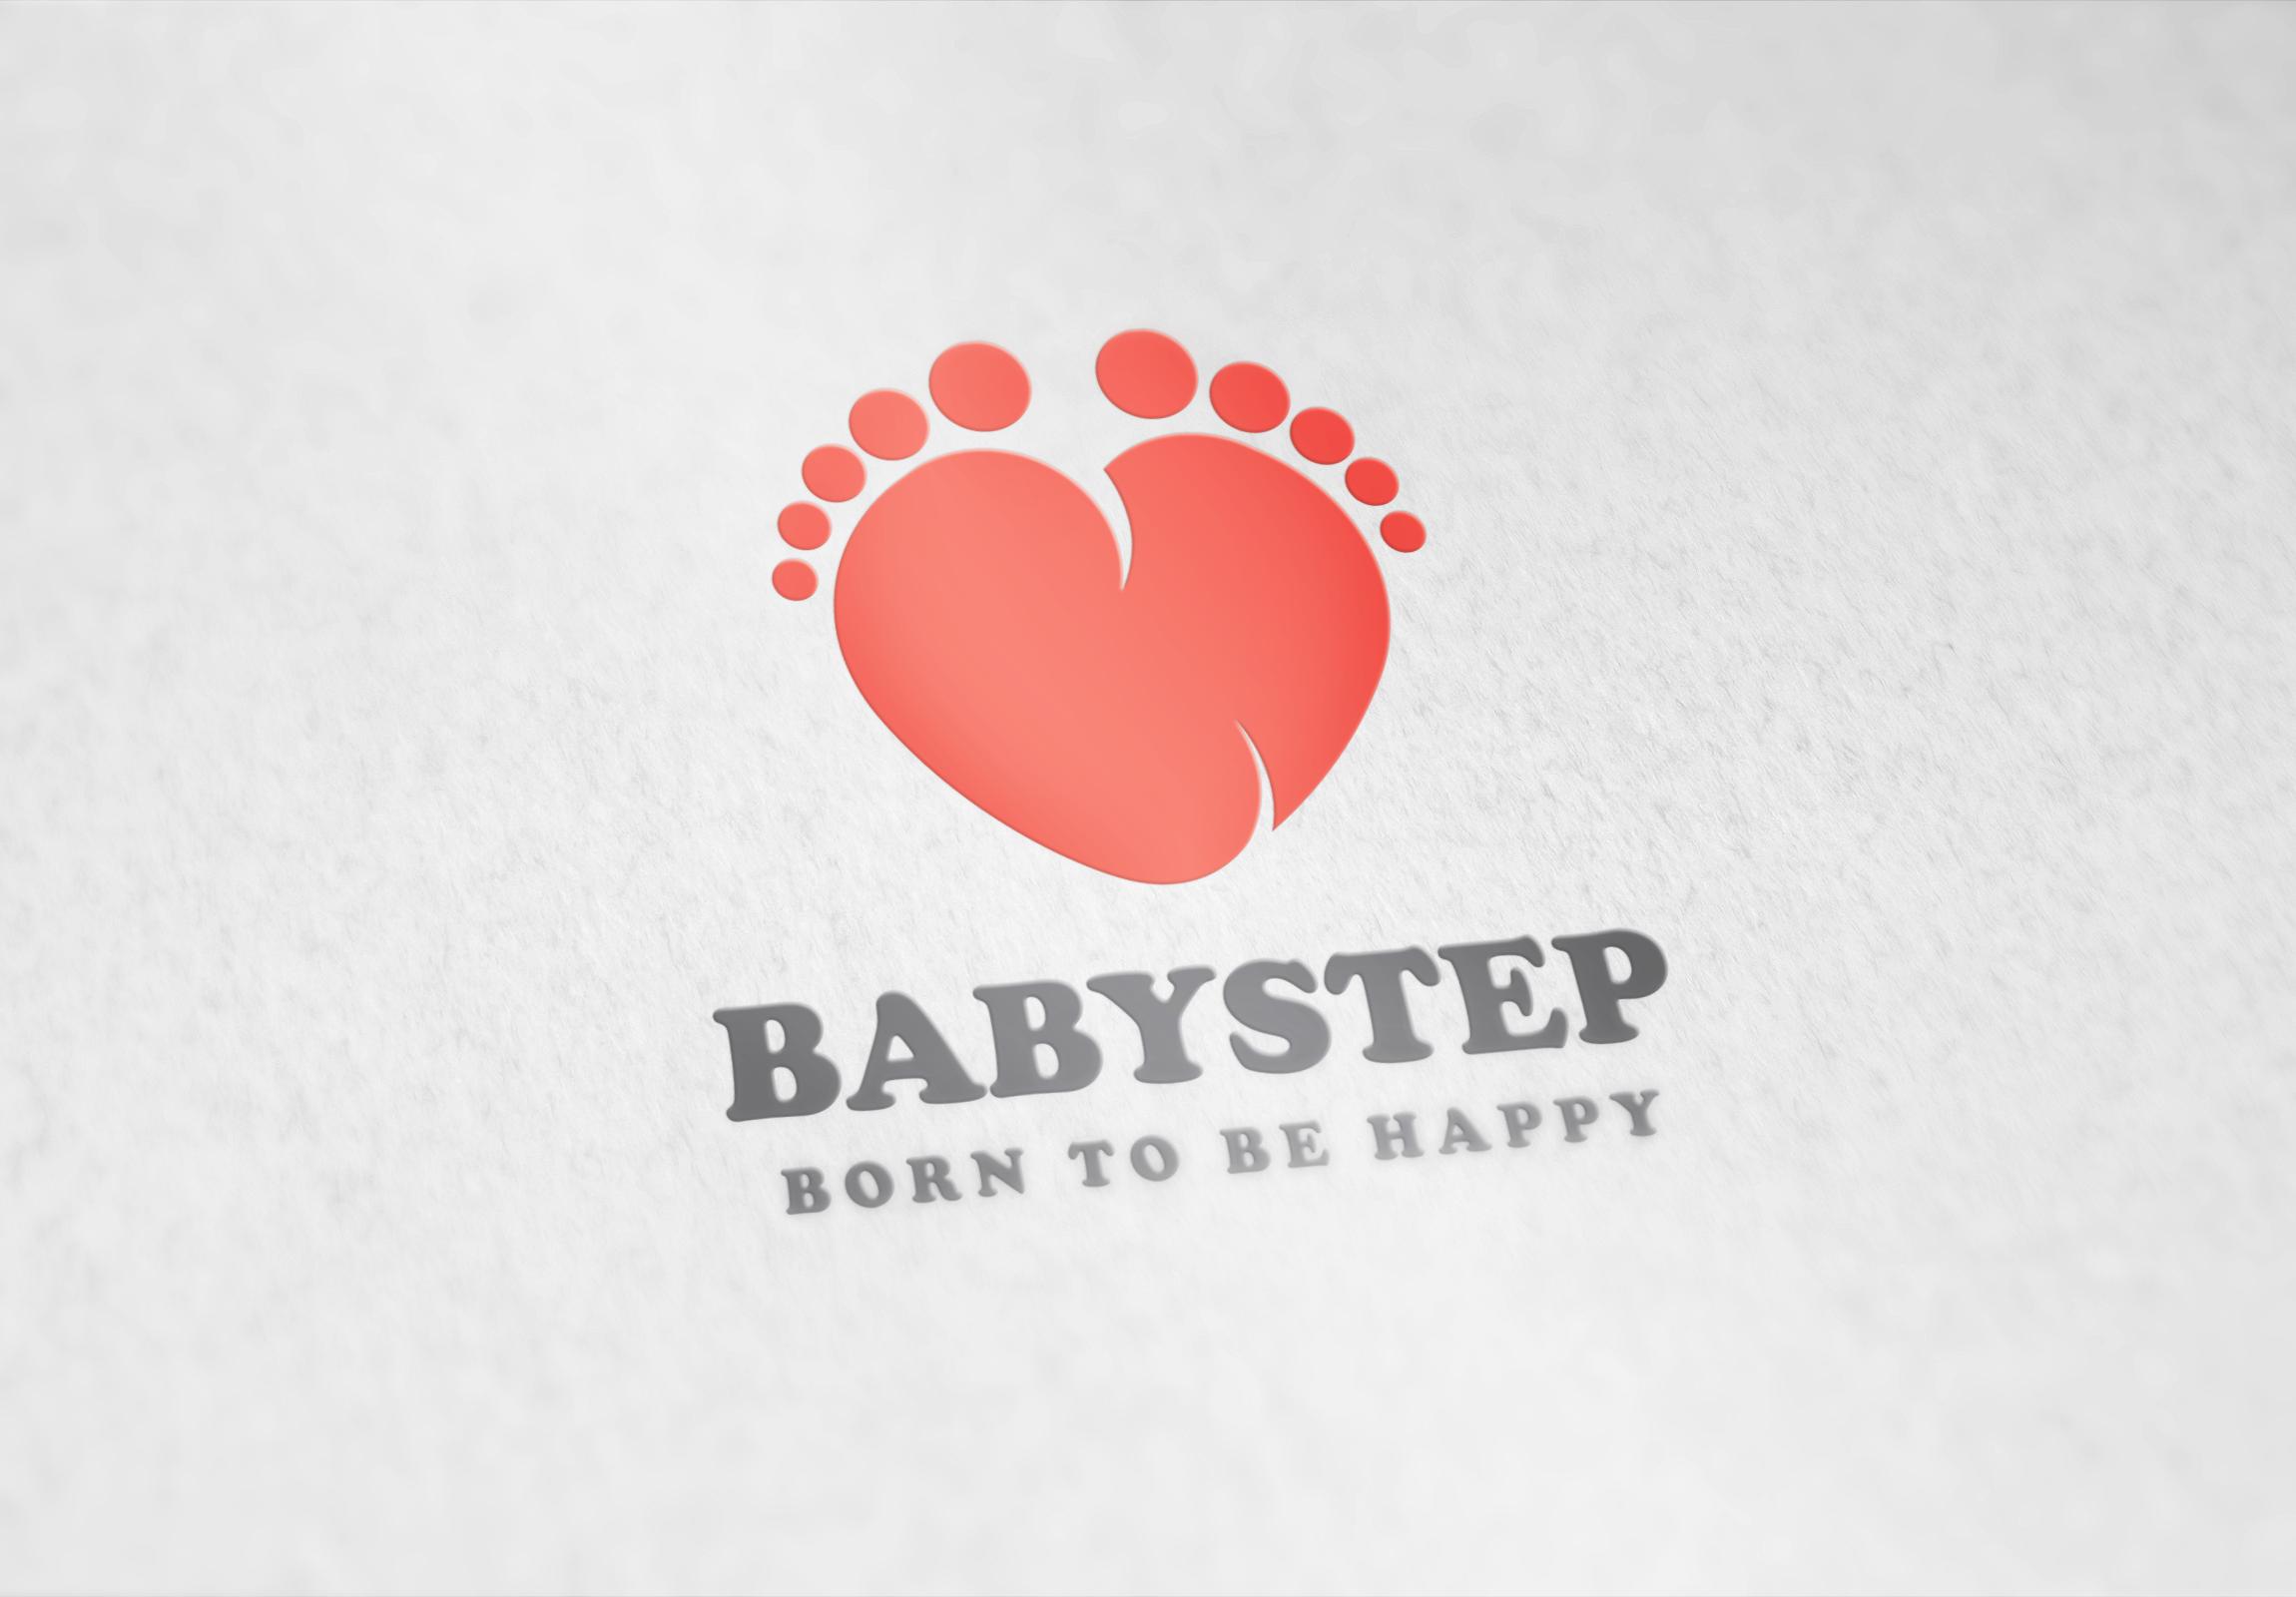 babysteo logo design, ლოგოს დამზადება, ლოგოს დიზაინი, ლოგოების შექმნა, ლოგოების დამზადება, ლოგოს დამზადების ფასი, ბრენდინგი, ბანერების დამზადება, ლოგოტიპის შექმნა, ლოგოტიპების დიზაინი, ოპტიმიზაცია, facebook დიზაინი, ვებგვერდის დიზაინი, ლოგოების დიზაინი, ლოგოტიპების დამზადება, saitebis damzadena, logoebis damzadena, saitis damzadeba, logos damzadeba,